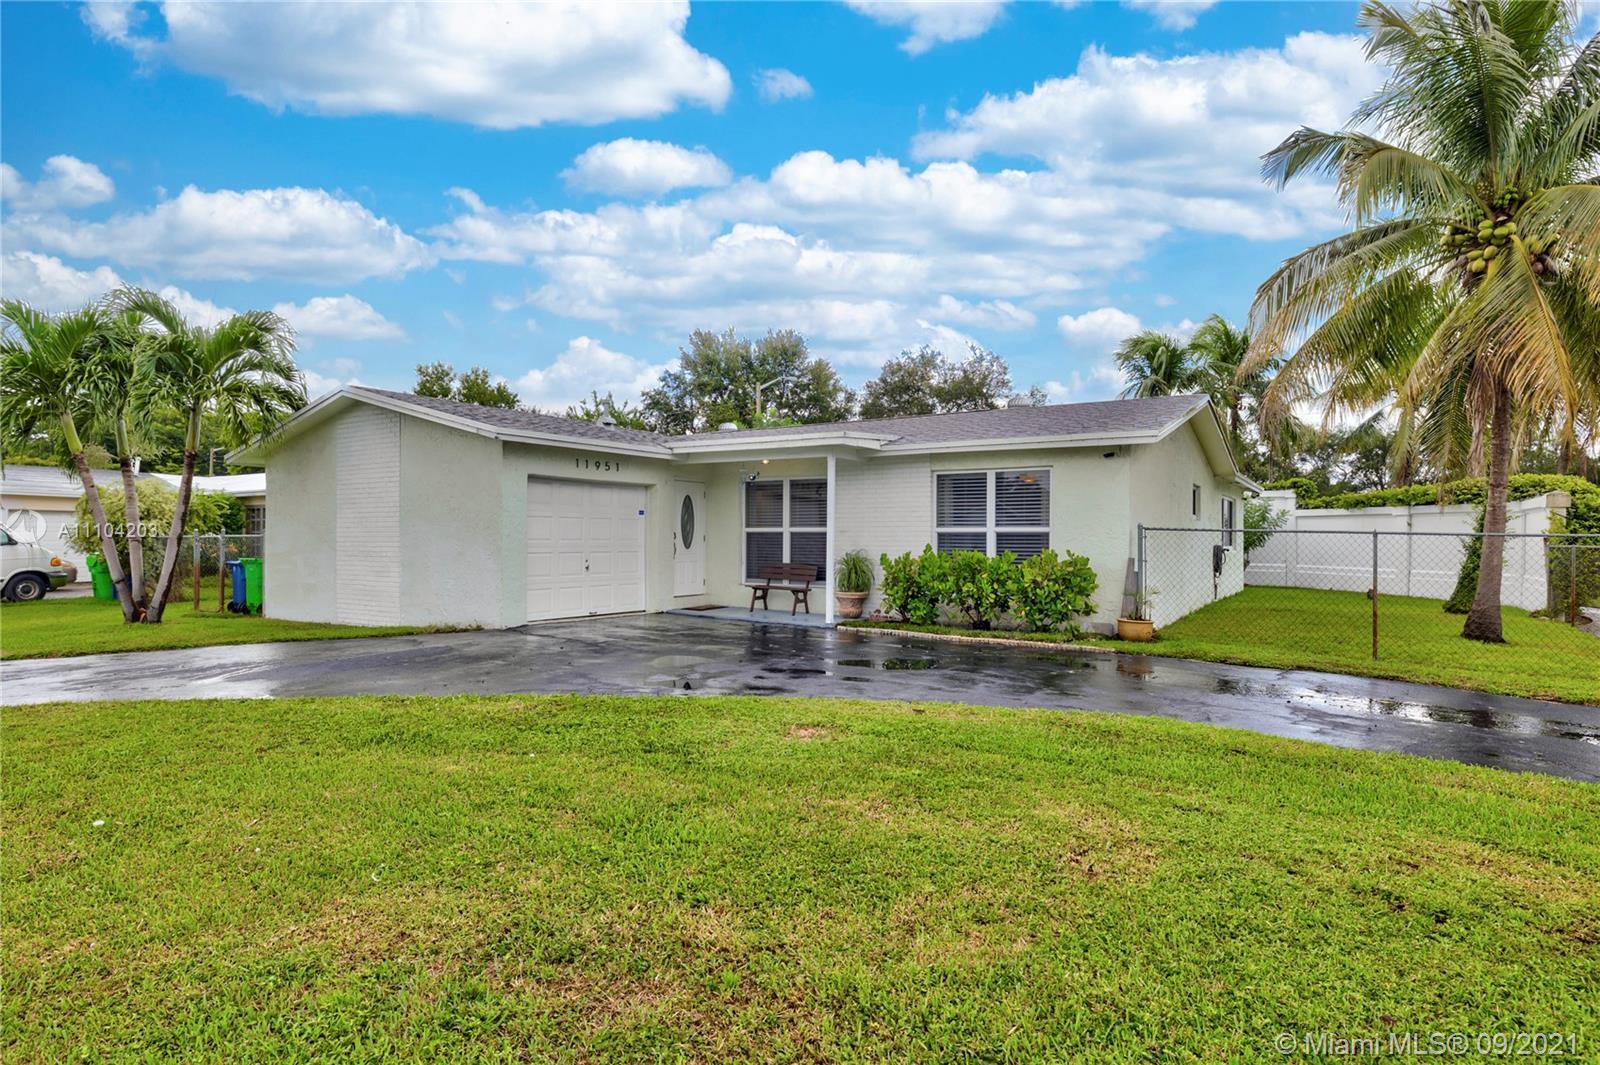 Sunrise Golf Village - 11951 NW 33rd St, Sunrise, FL 33323